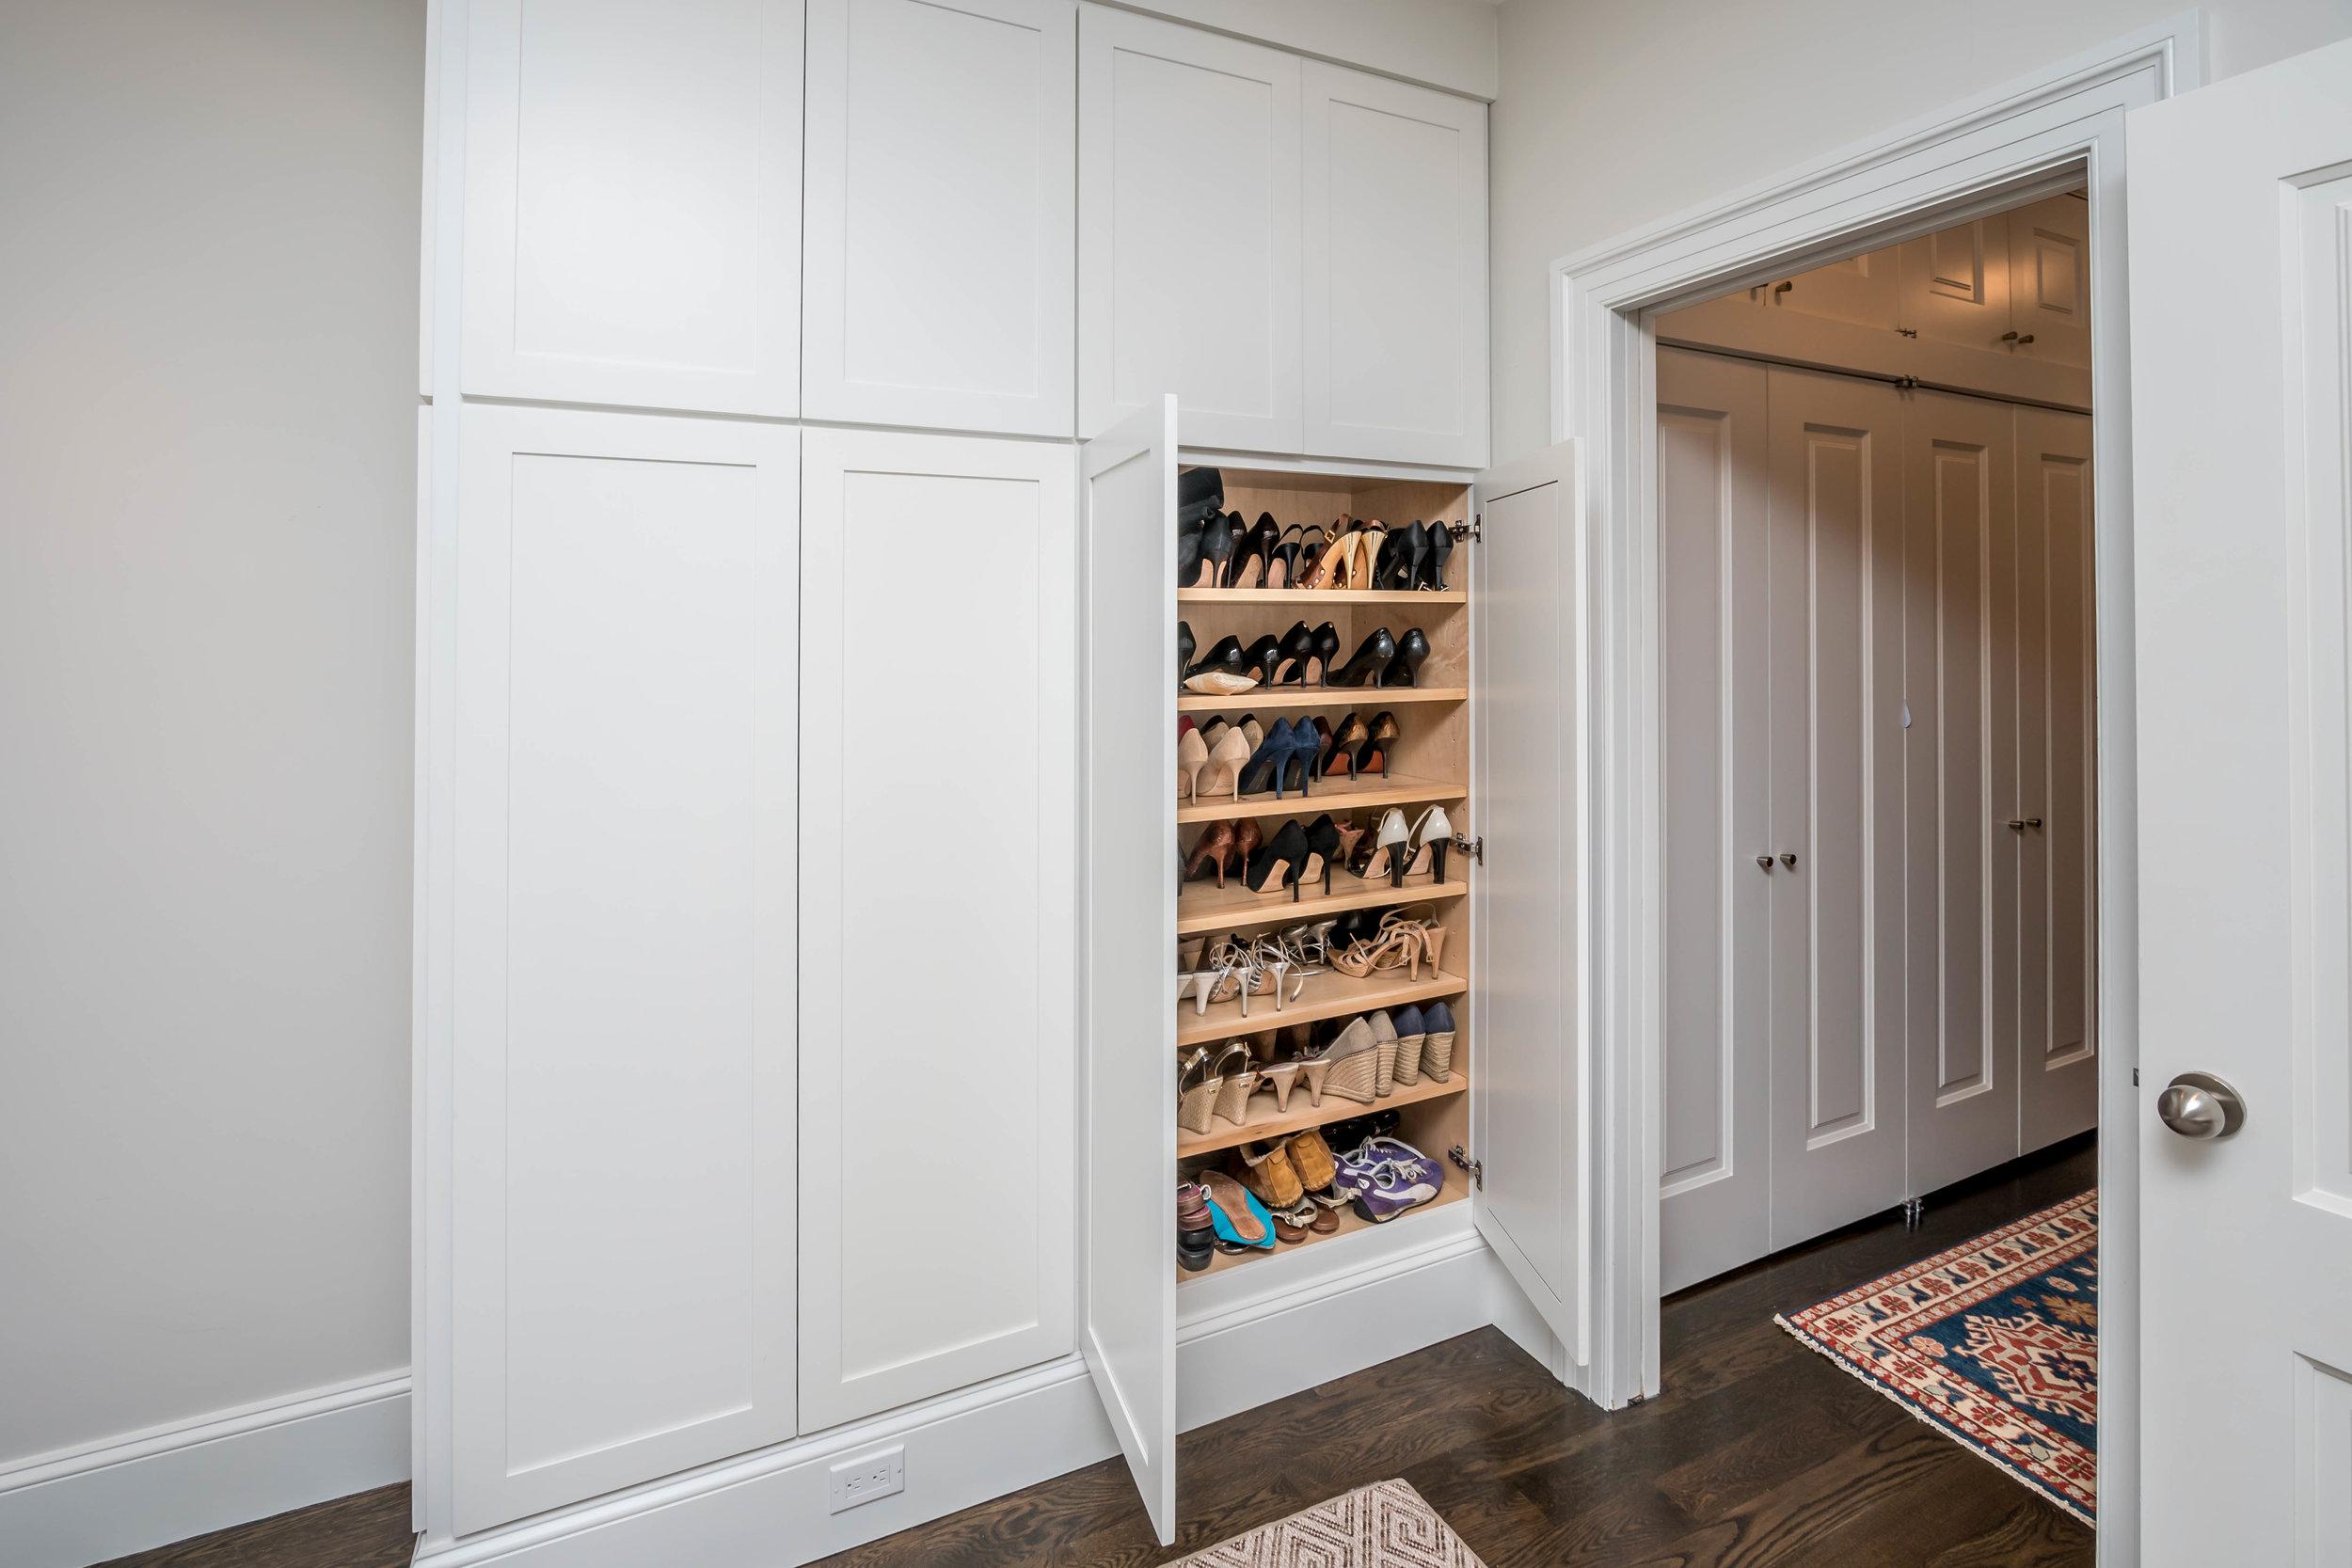 Bedroom Built-in Cabinetry